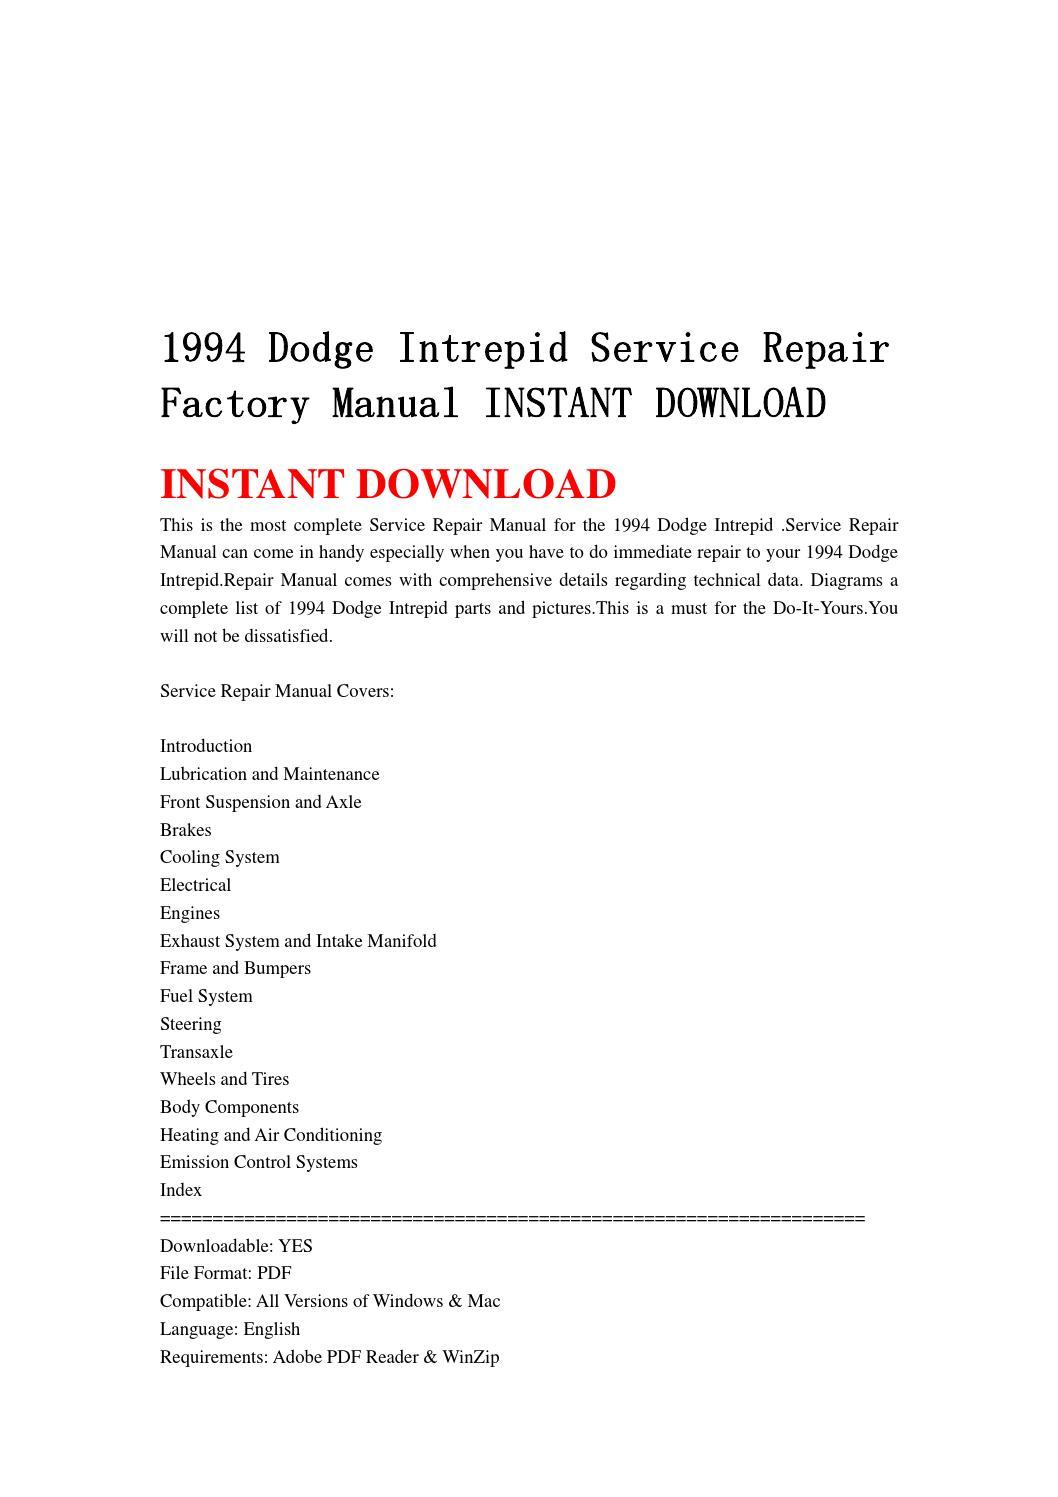 1994 Dodge Intrepid Service Repair Factory Manual Instant